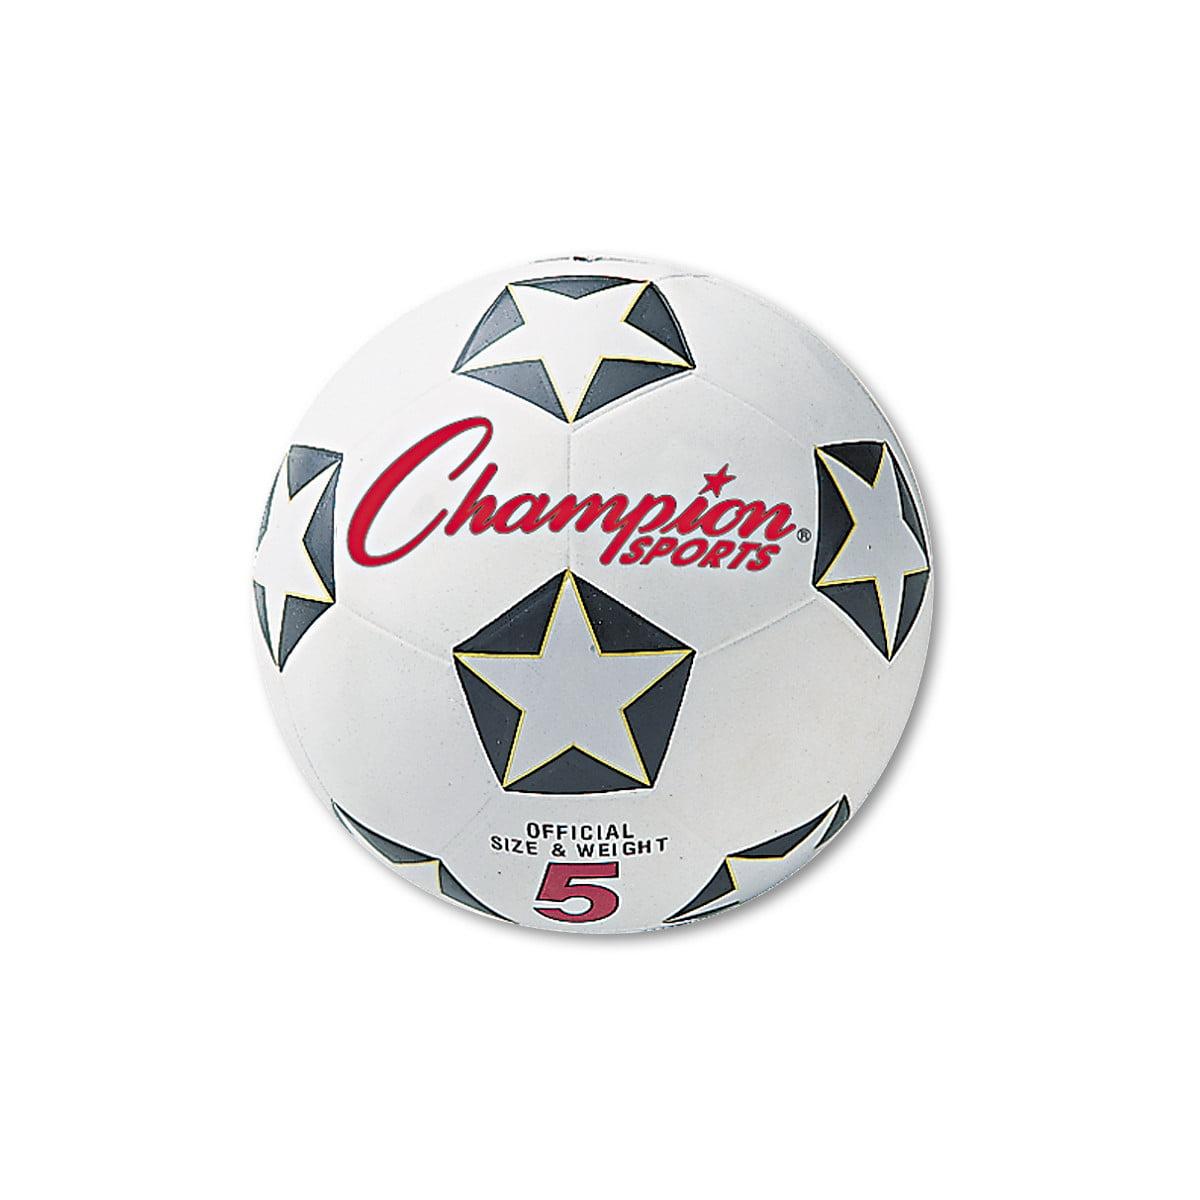 Champion Sports Rubber Sports Ball, For Soccer, No. 4, White/Black